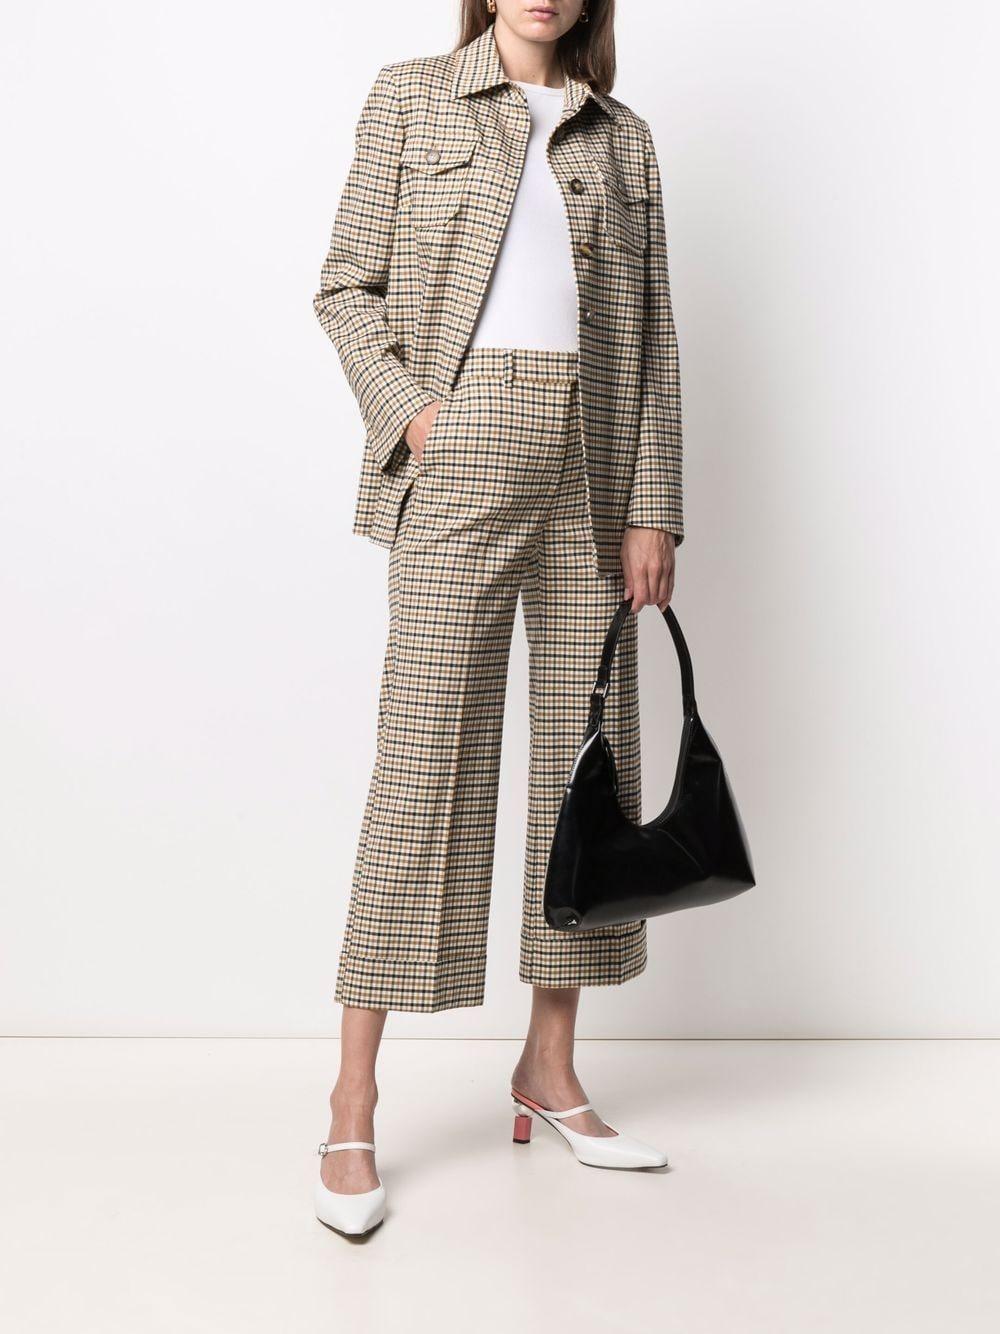 camicia a quadri beige e nera in lana vergine ALBERTO BIANI | Camicie | II873-WO215364